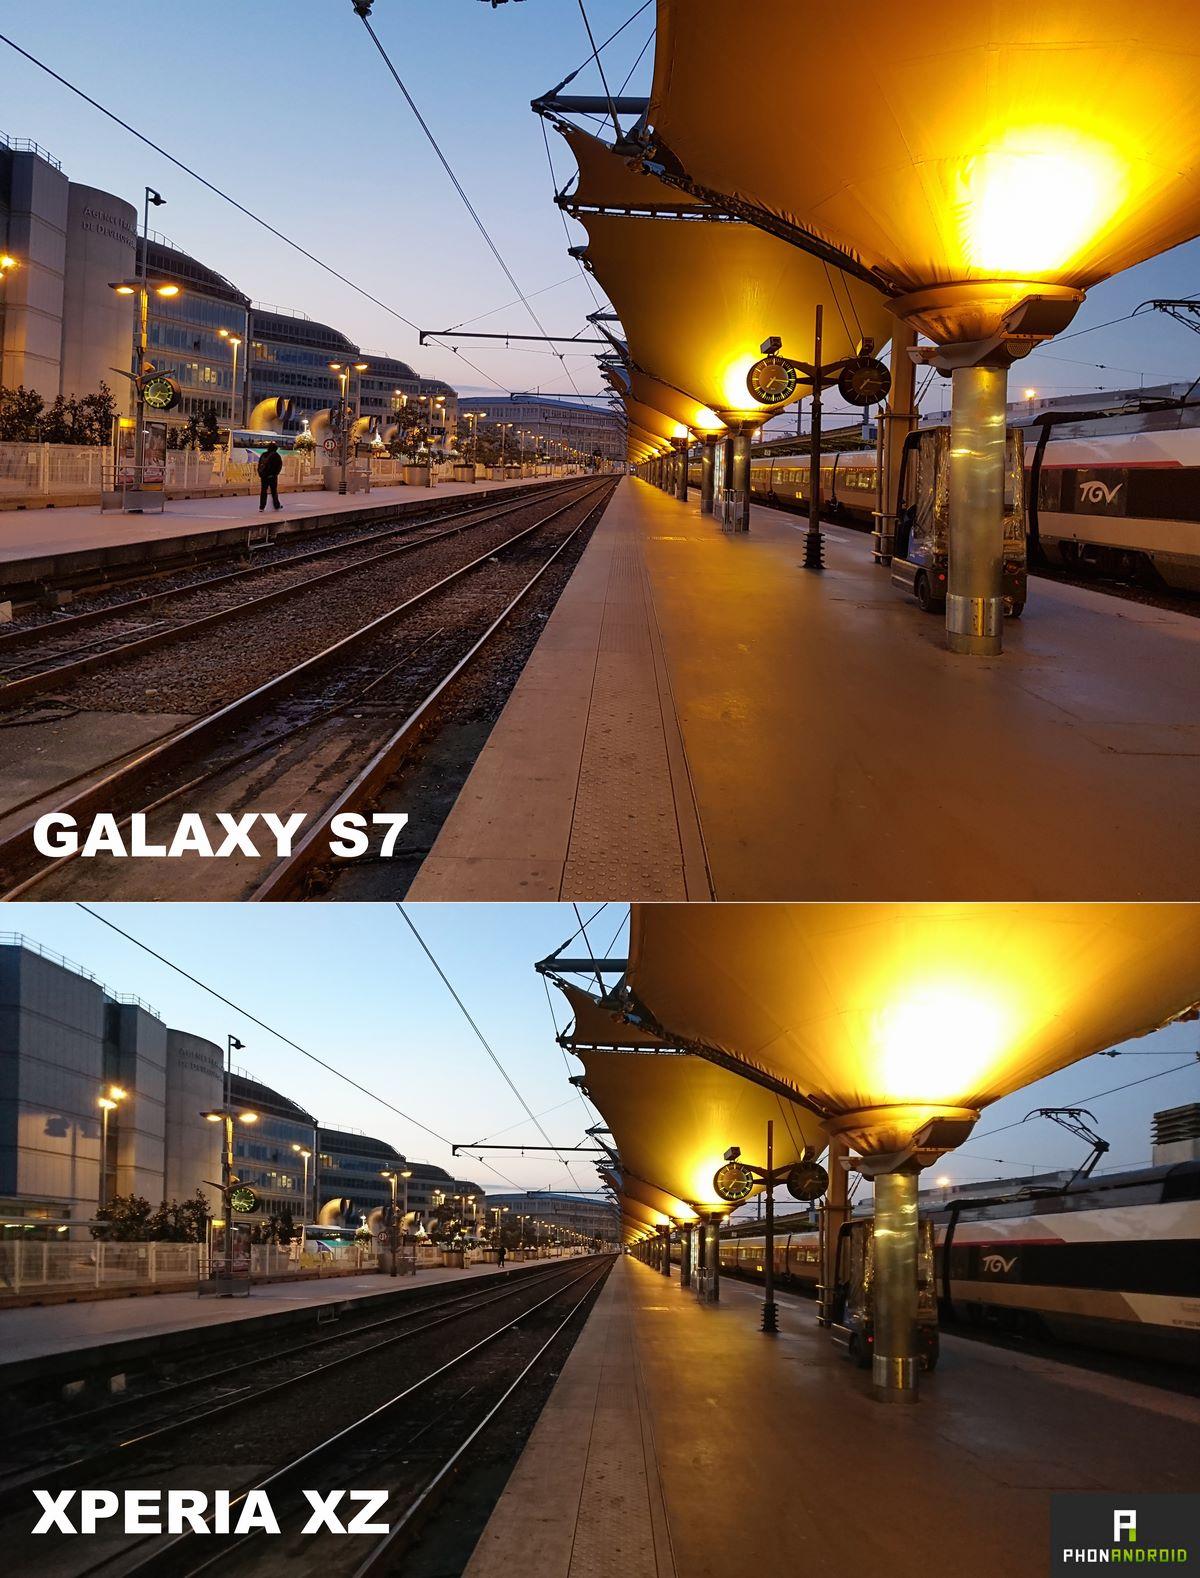 photo-sony-xperia-xz-galaxy-s7